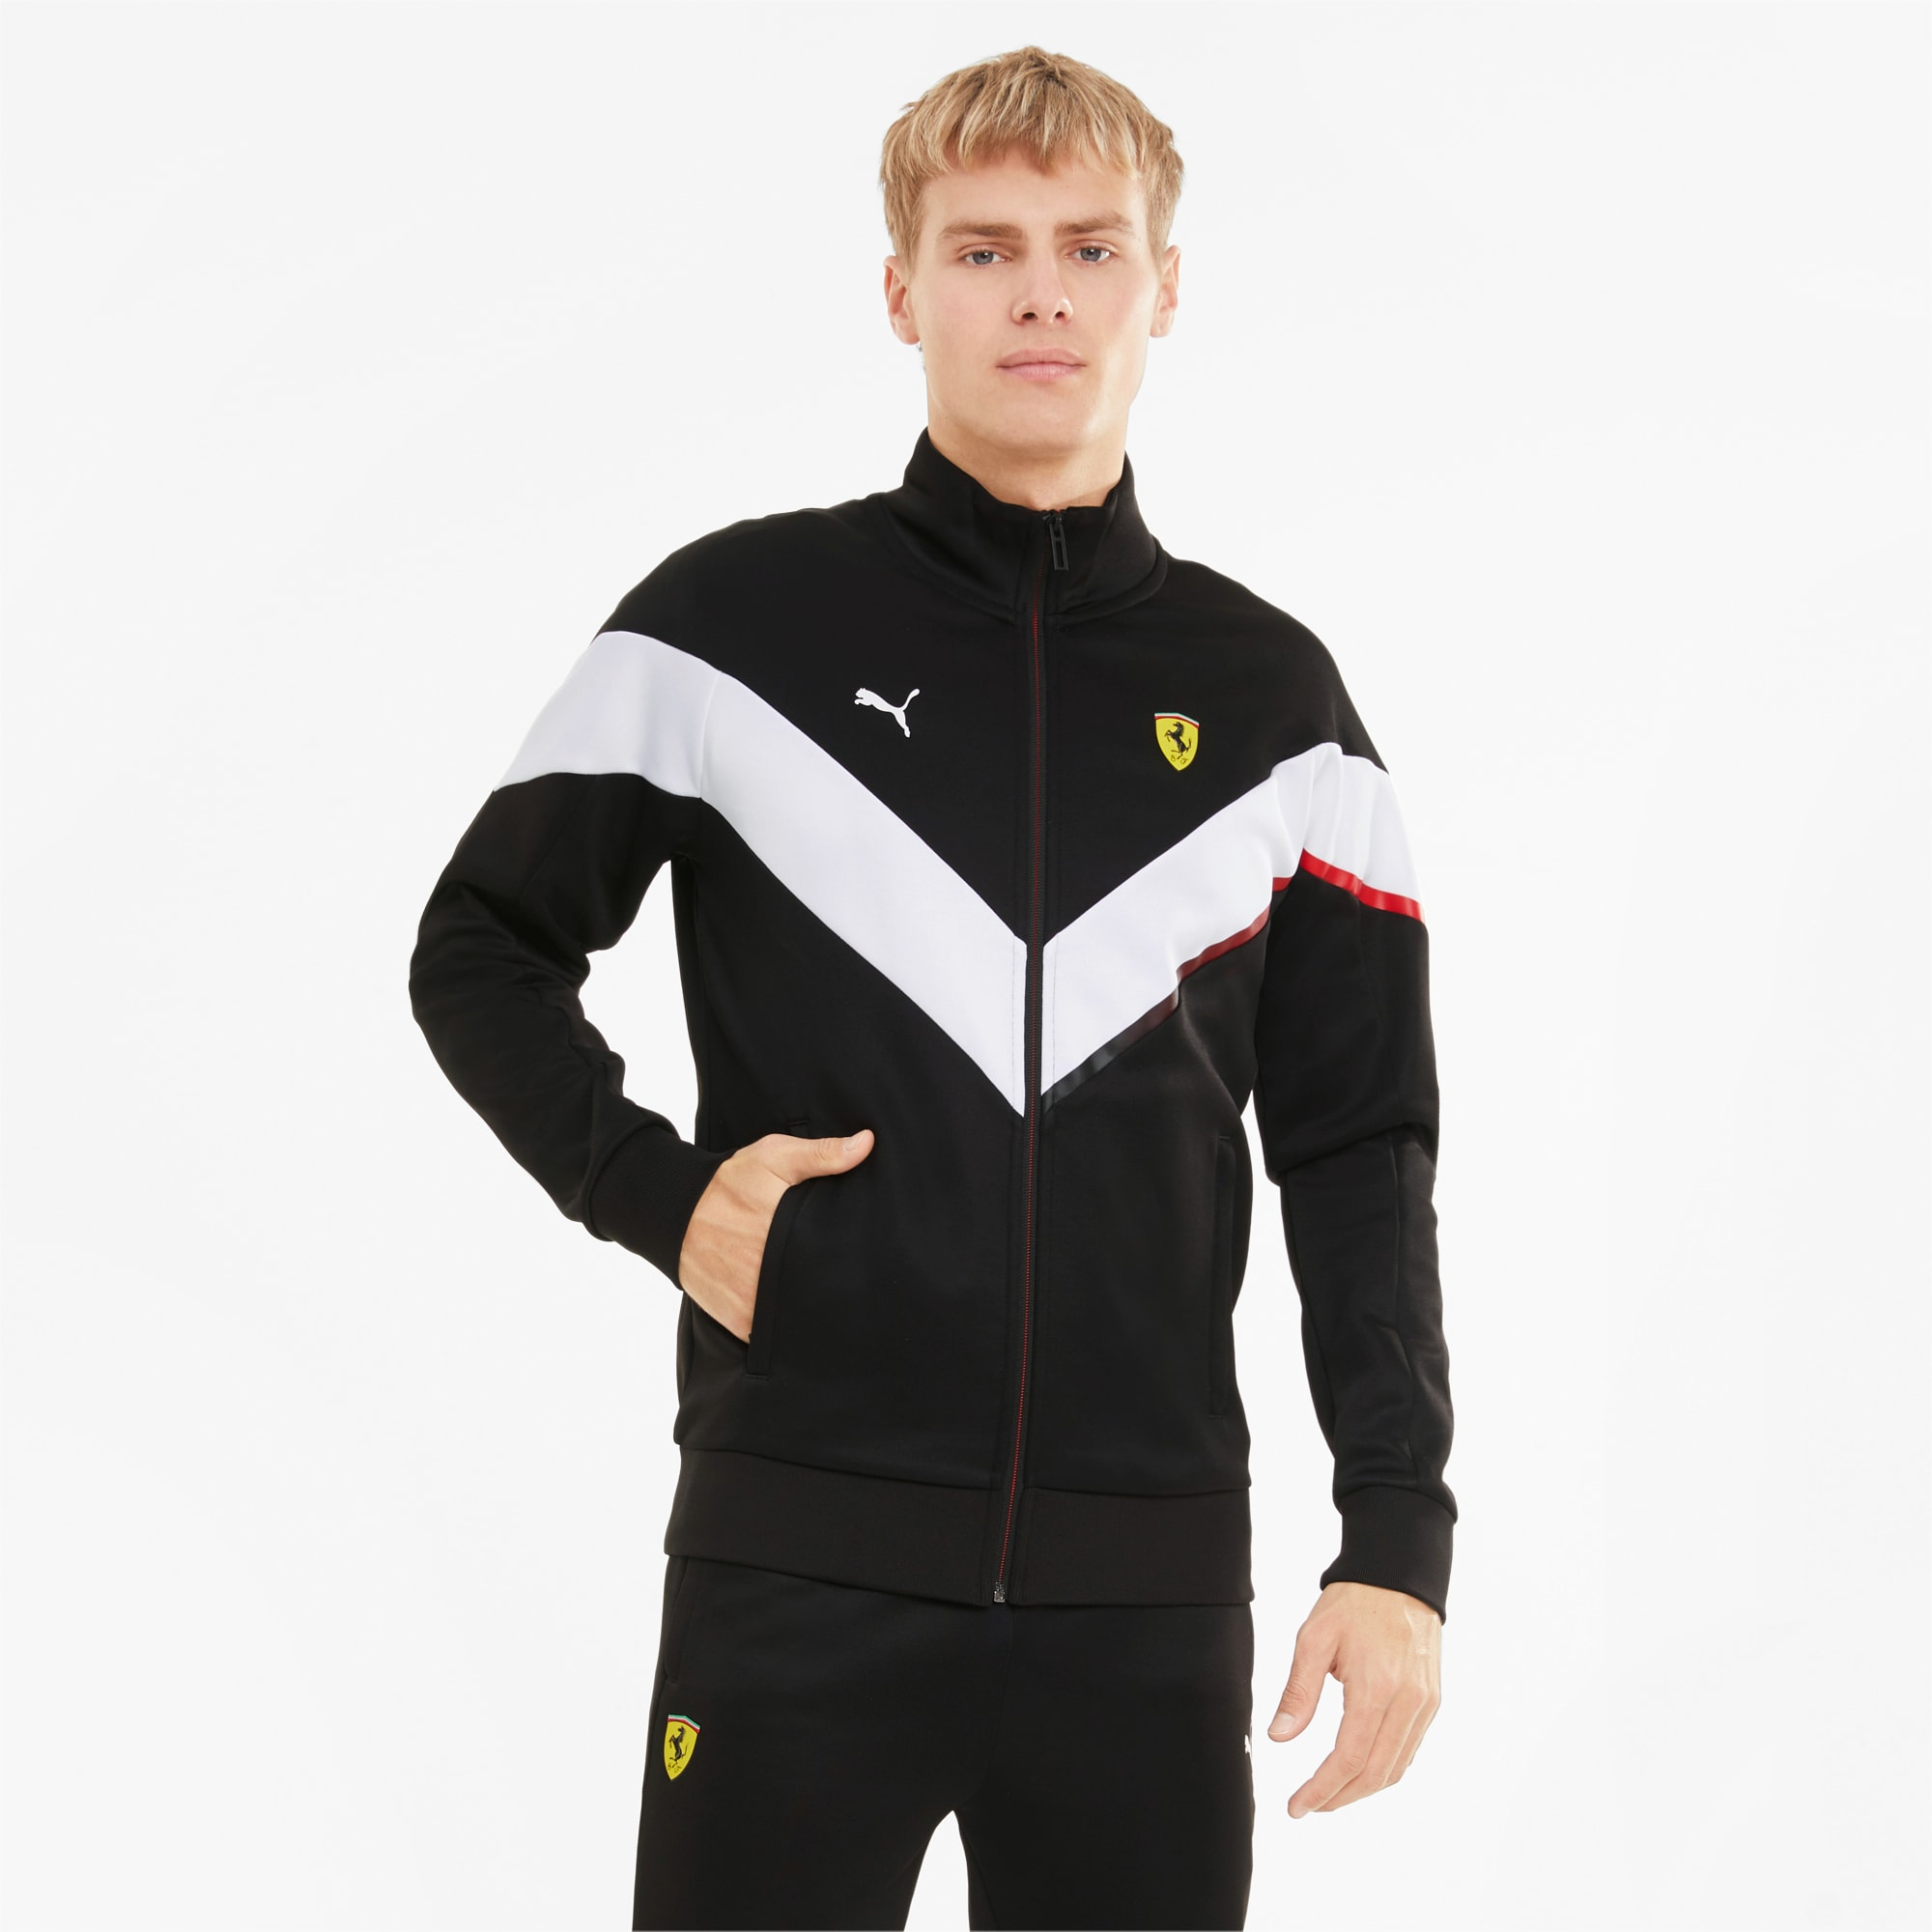 Scuderia Ferrari Mcs Men S Track Jacket Puma Black Puma Mens Styles Puma Germany